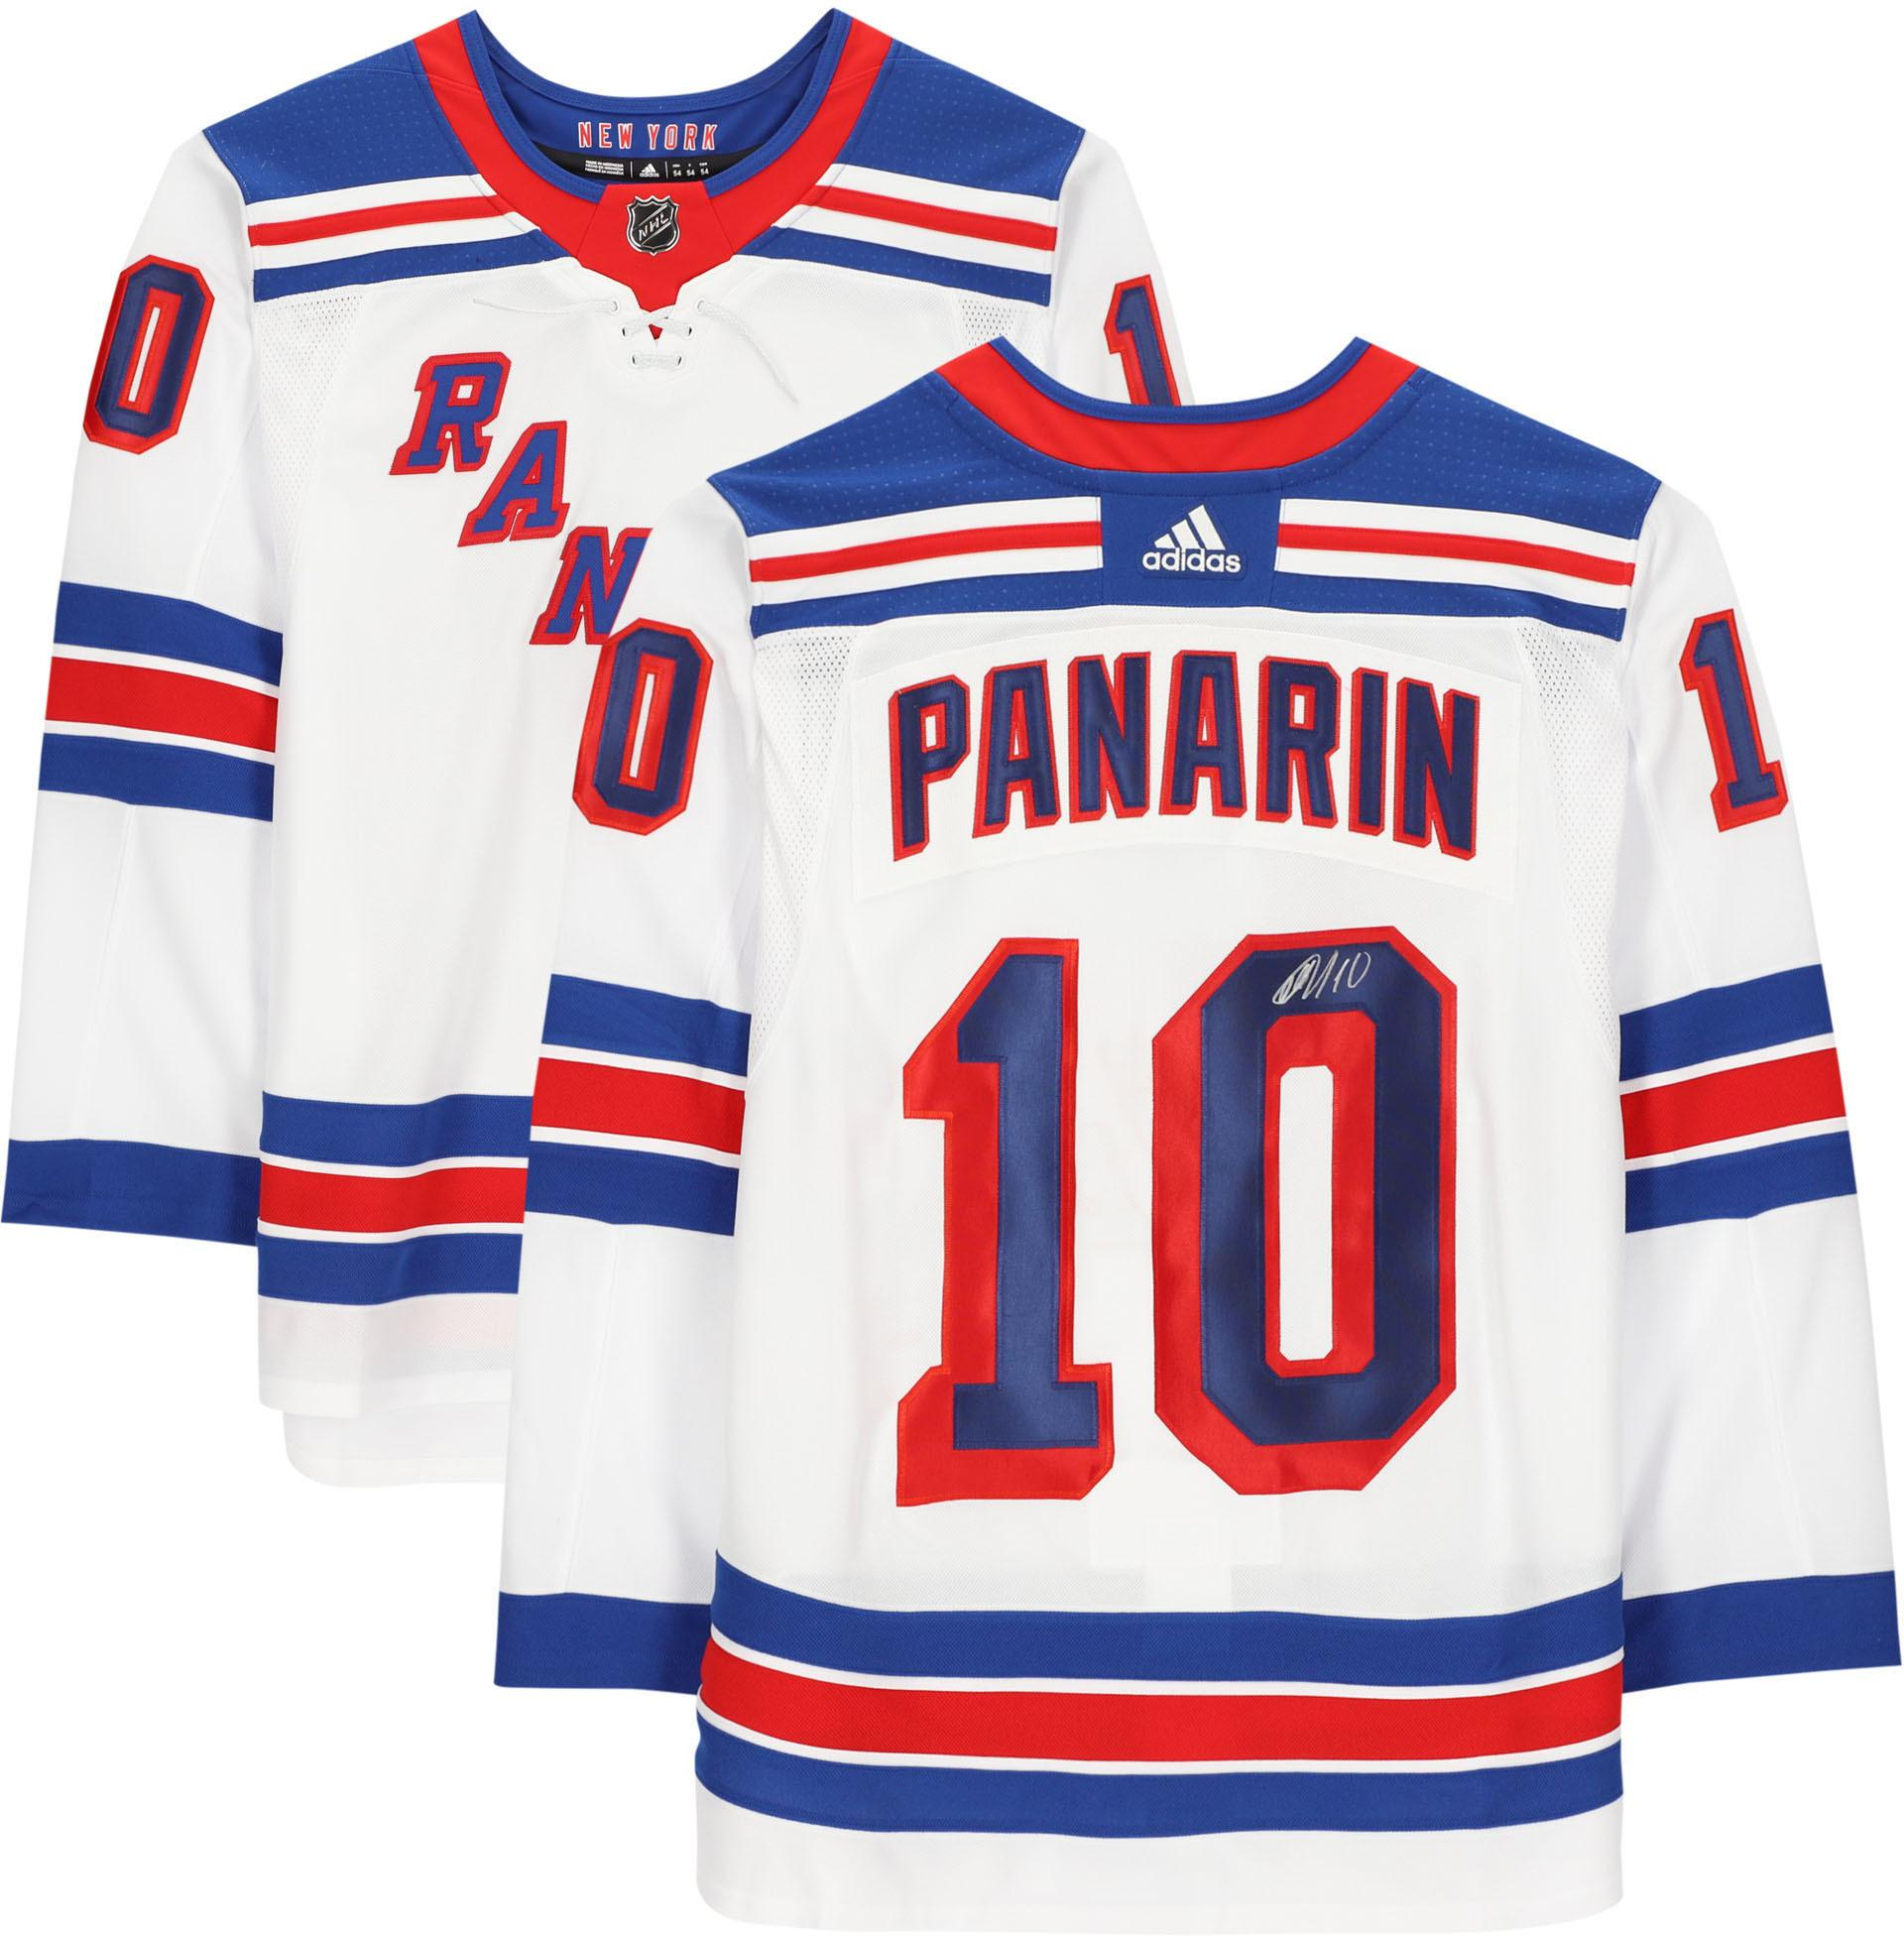 Artemi Panarin New York Rangers Autographed White Adidas Authentic Jersey - Fanatics Authentic Certified - Walmart.com